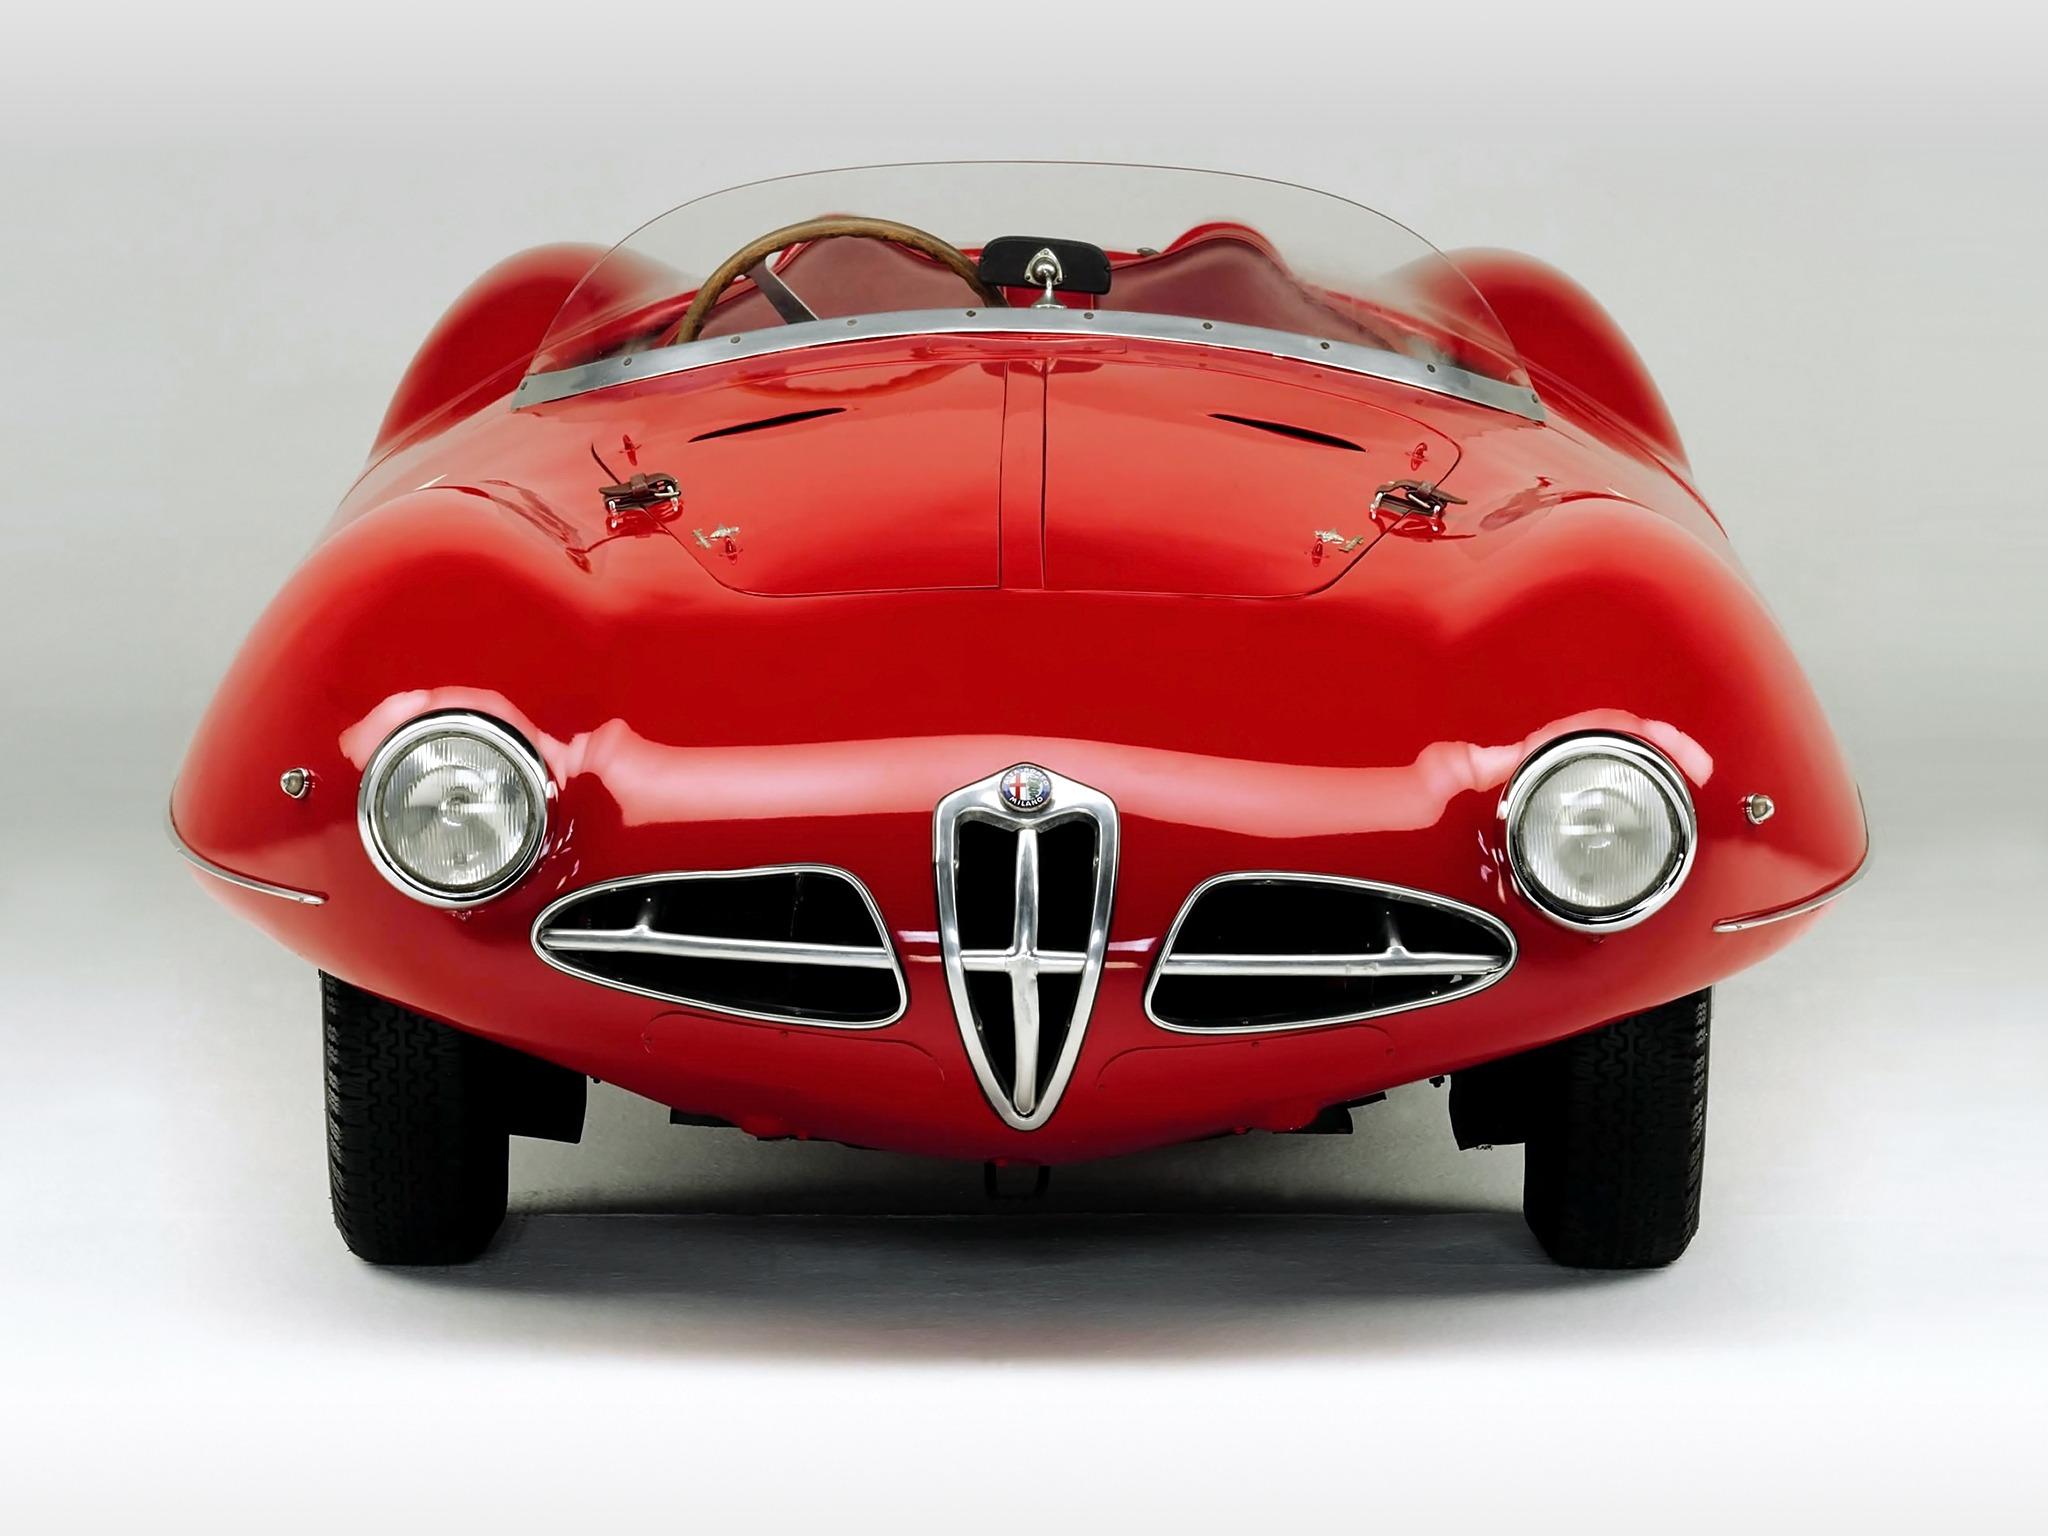 Alfa Romeo 1900 C52 Disco Volante Spider